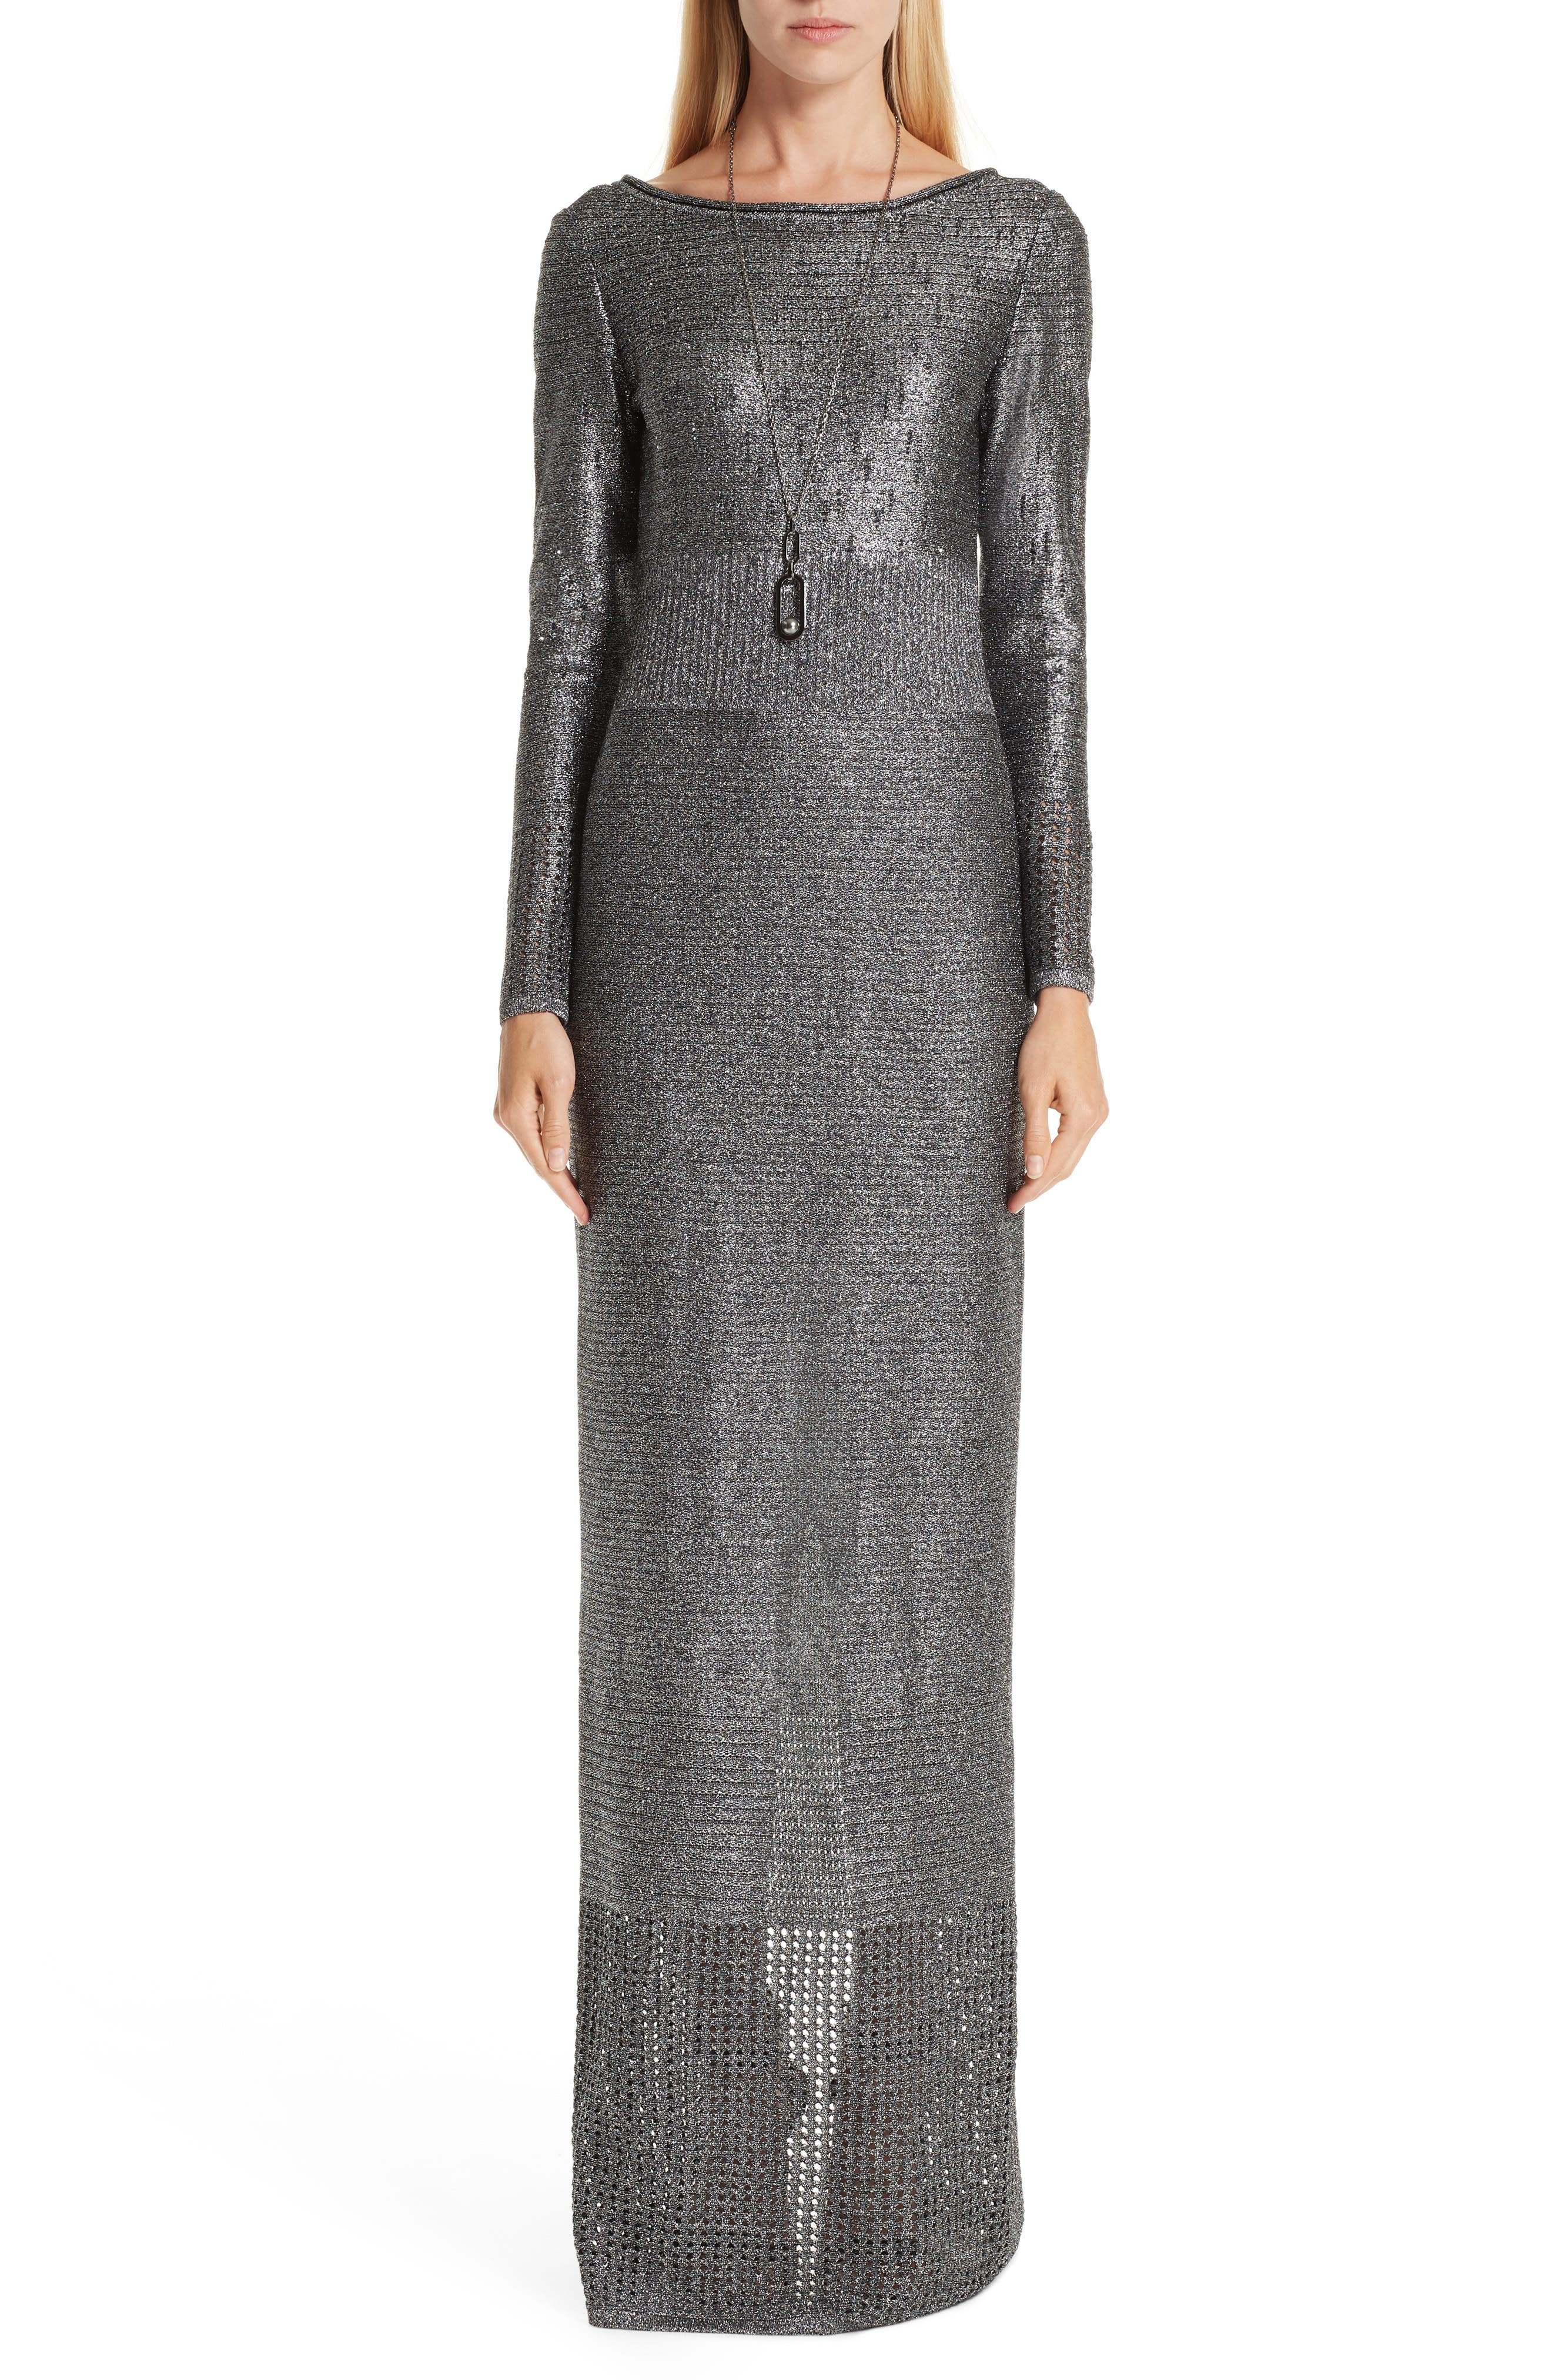 ST. JOHN COLLECTION, Metallic Plaited Mixed Knit Gown, Alternate thumbnail 6, color, GUNMETAL/ CAVIAR